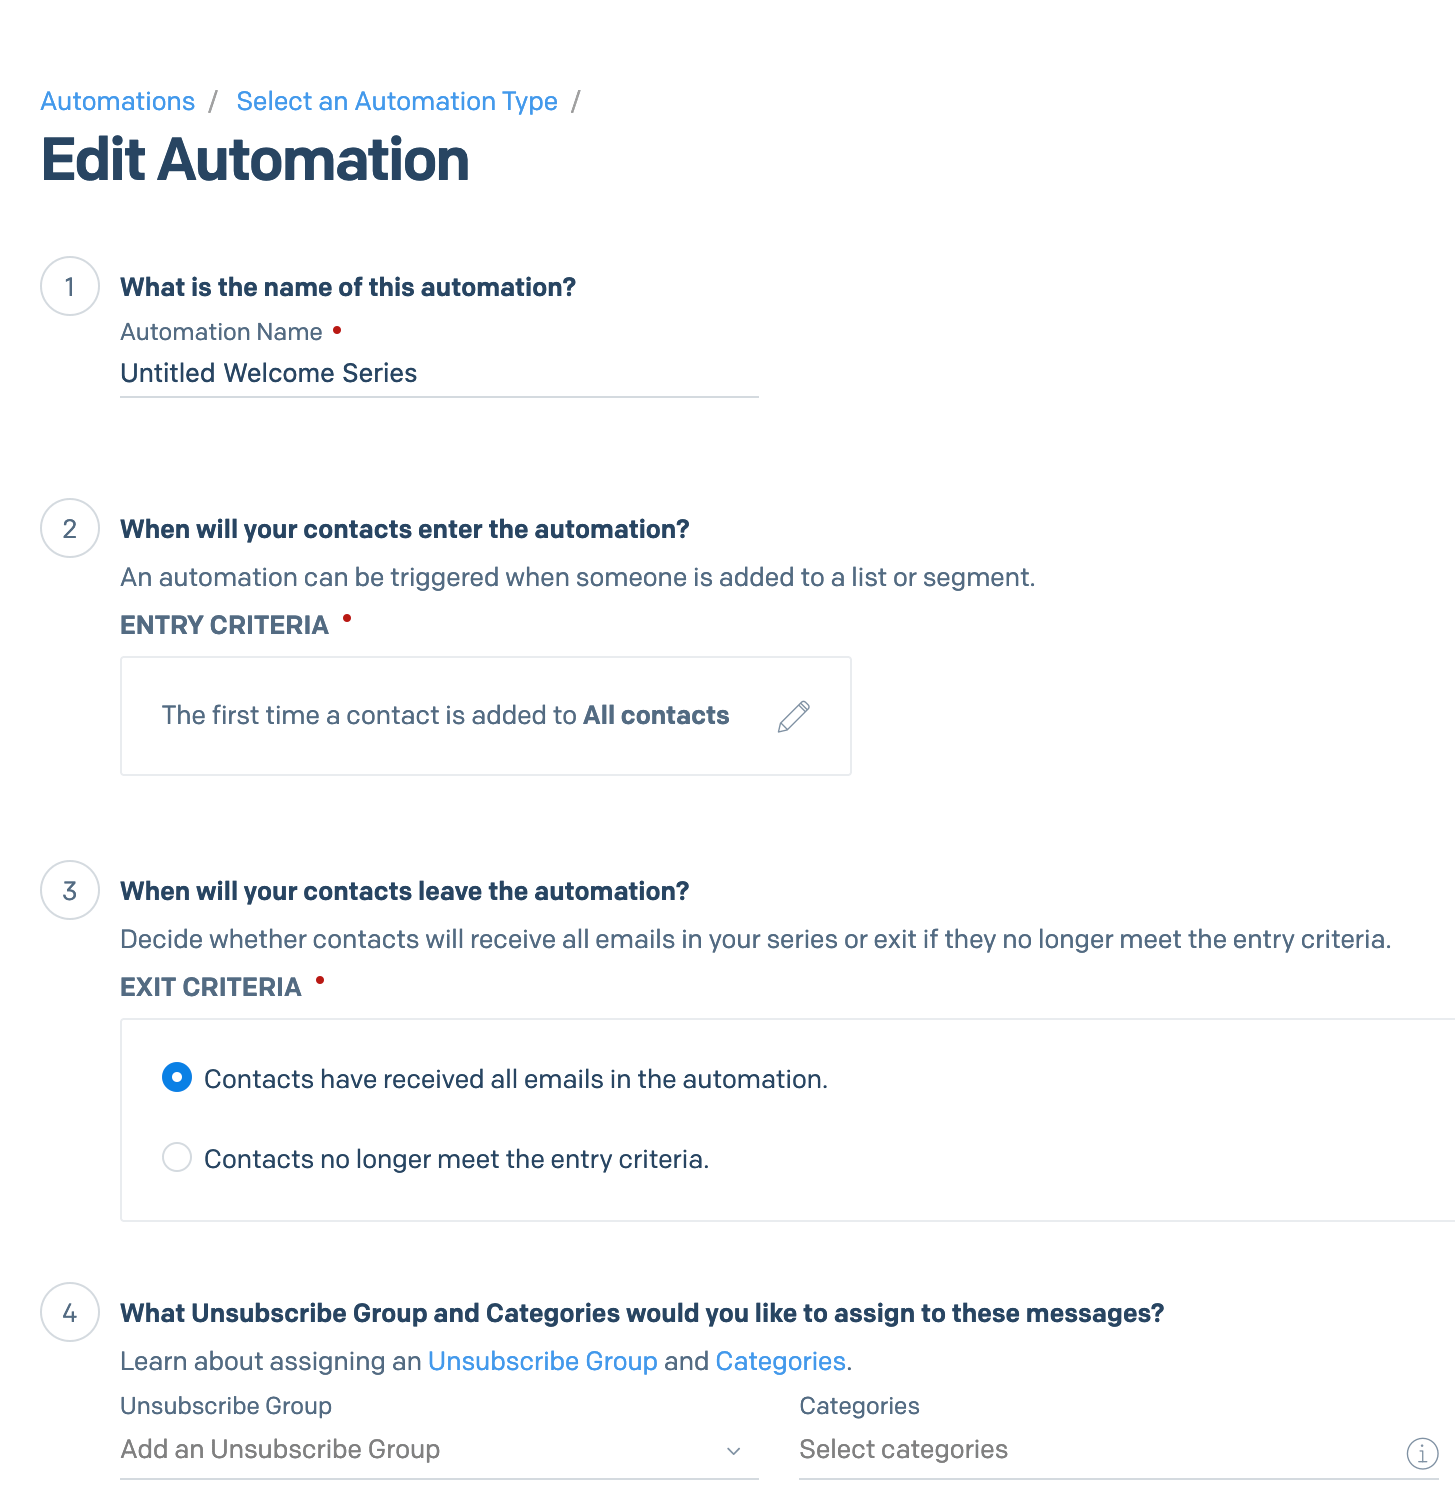 настройка параметров автоматизации Sendgrid